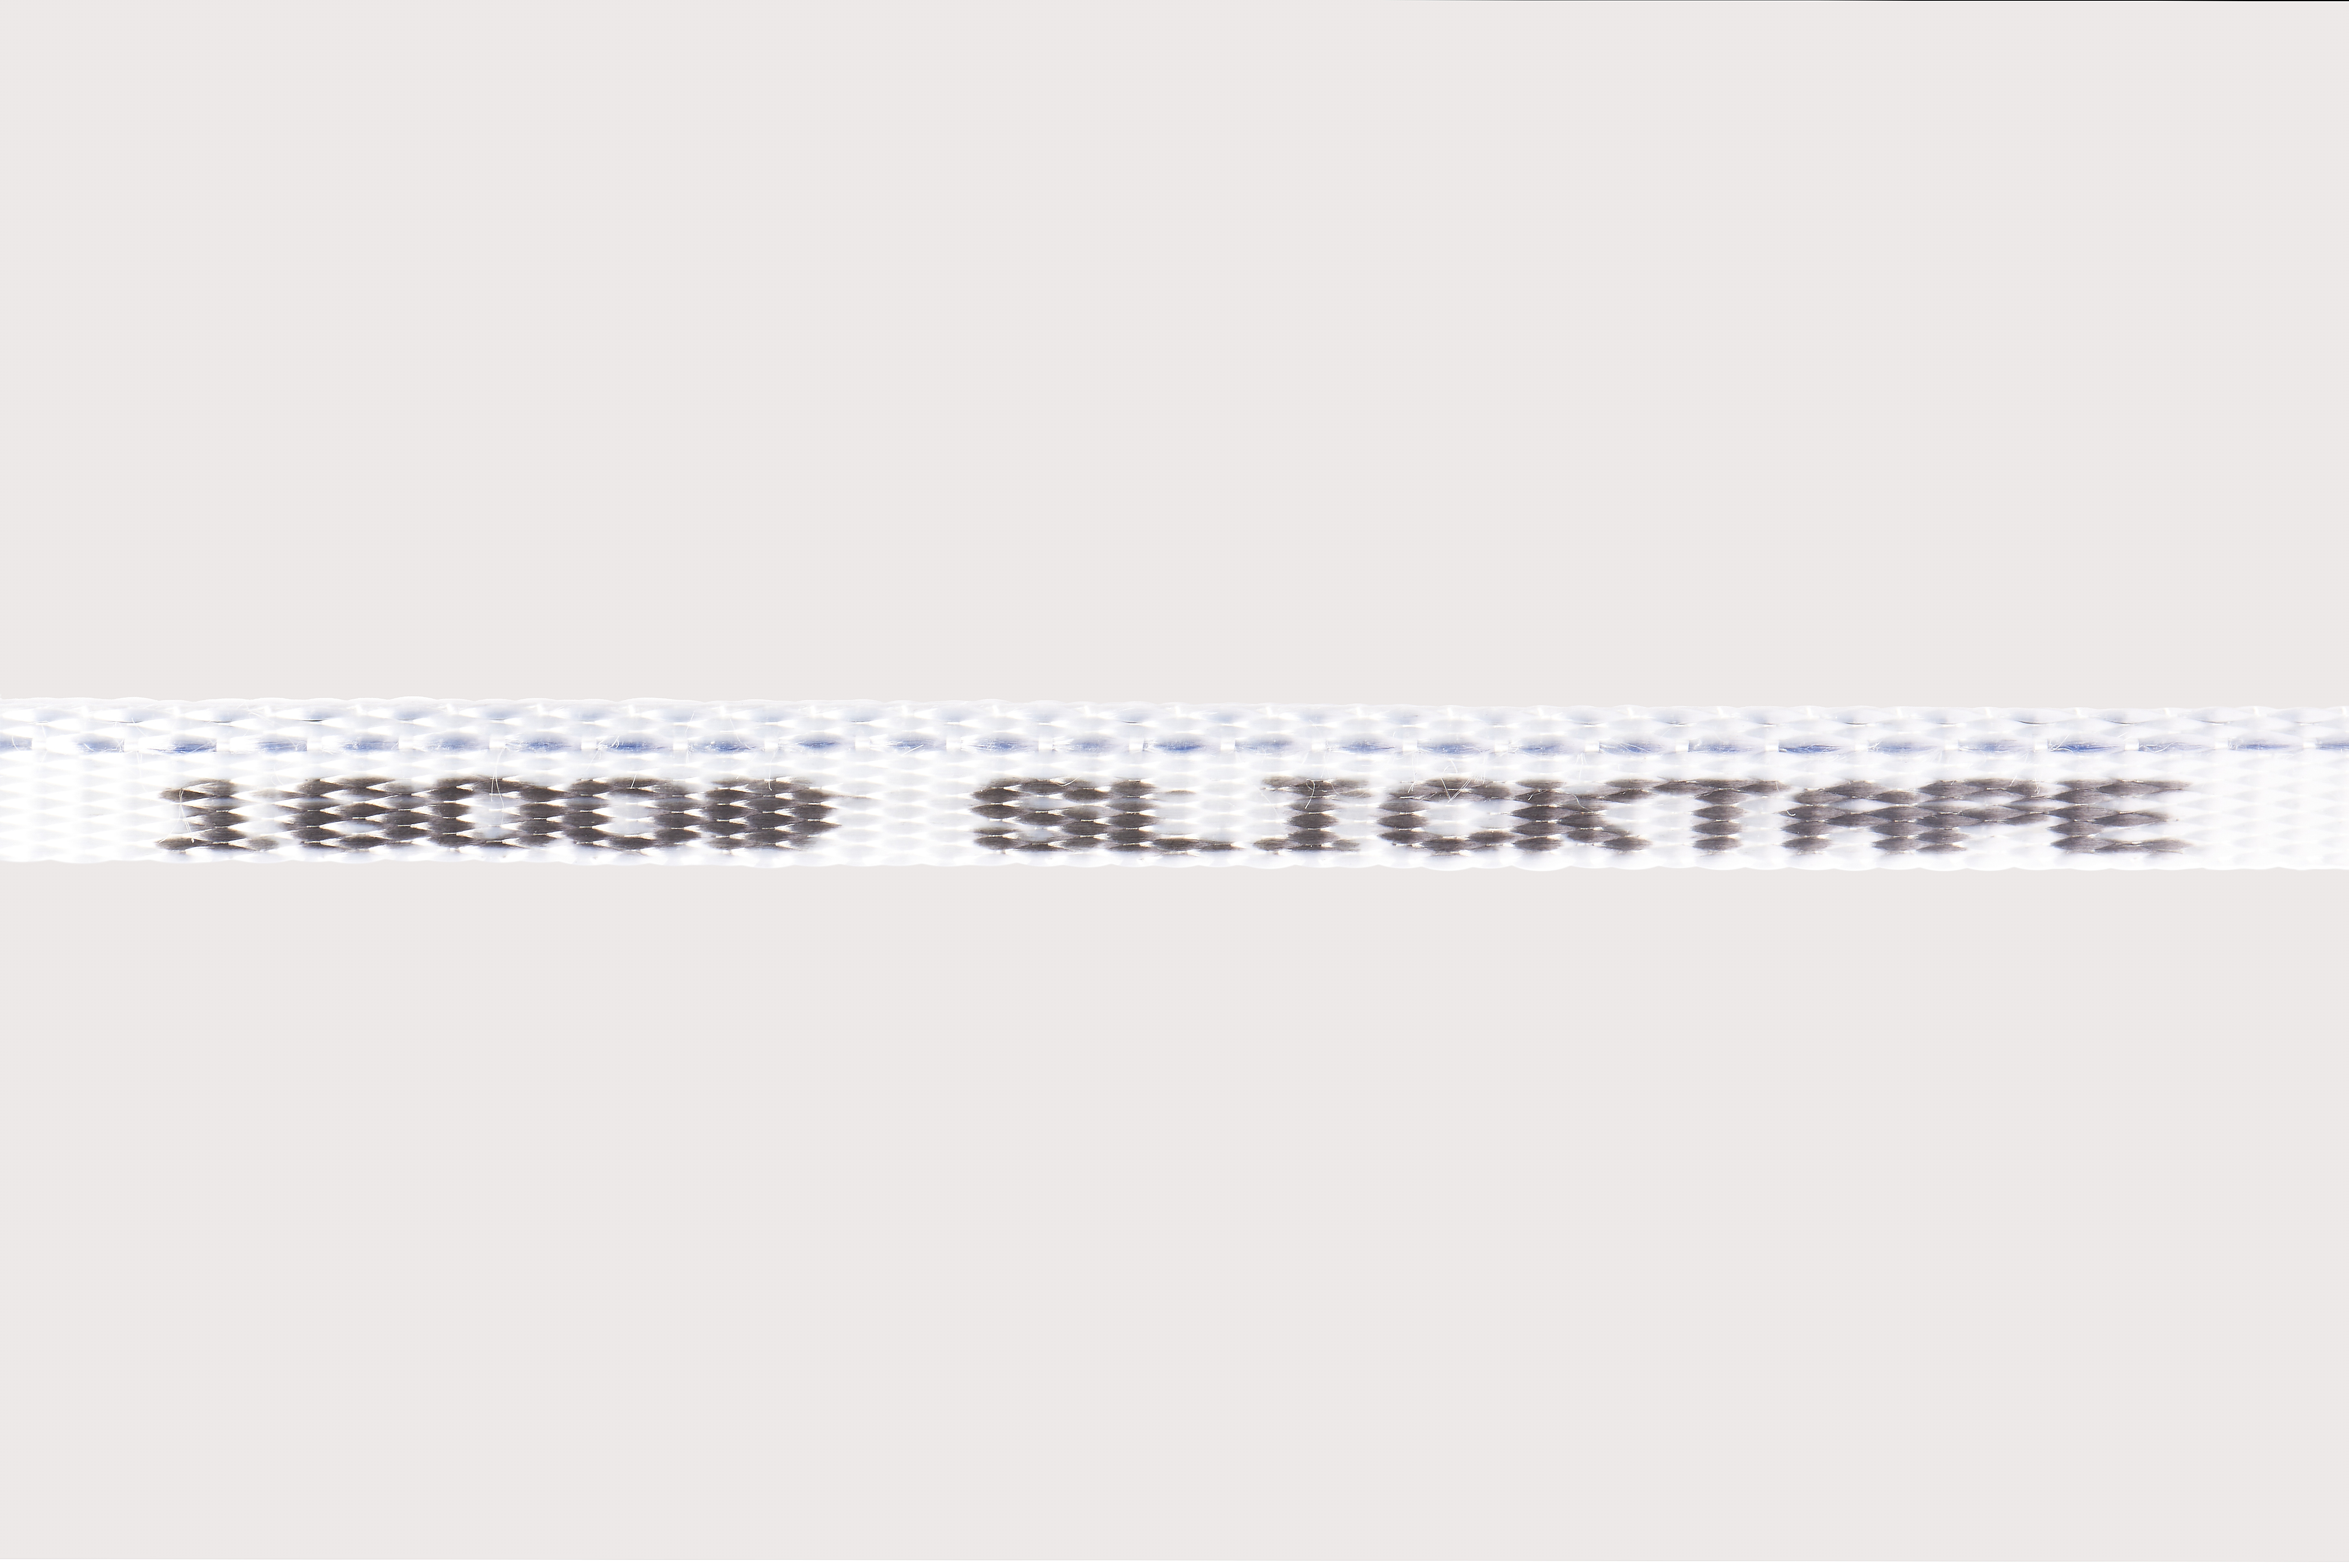 Orion-Cordage-Slick-Tape-White-Horizontal68.jpg